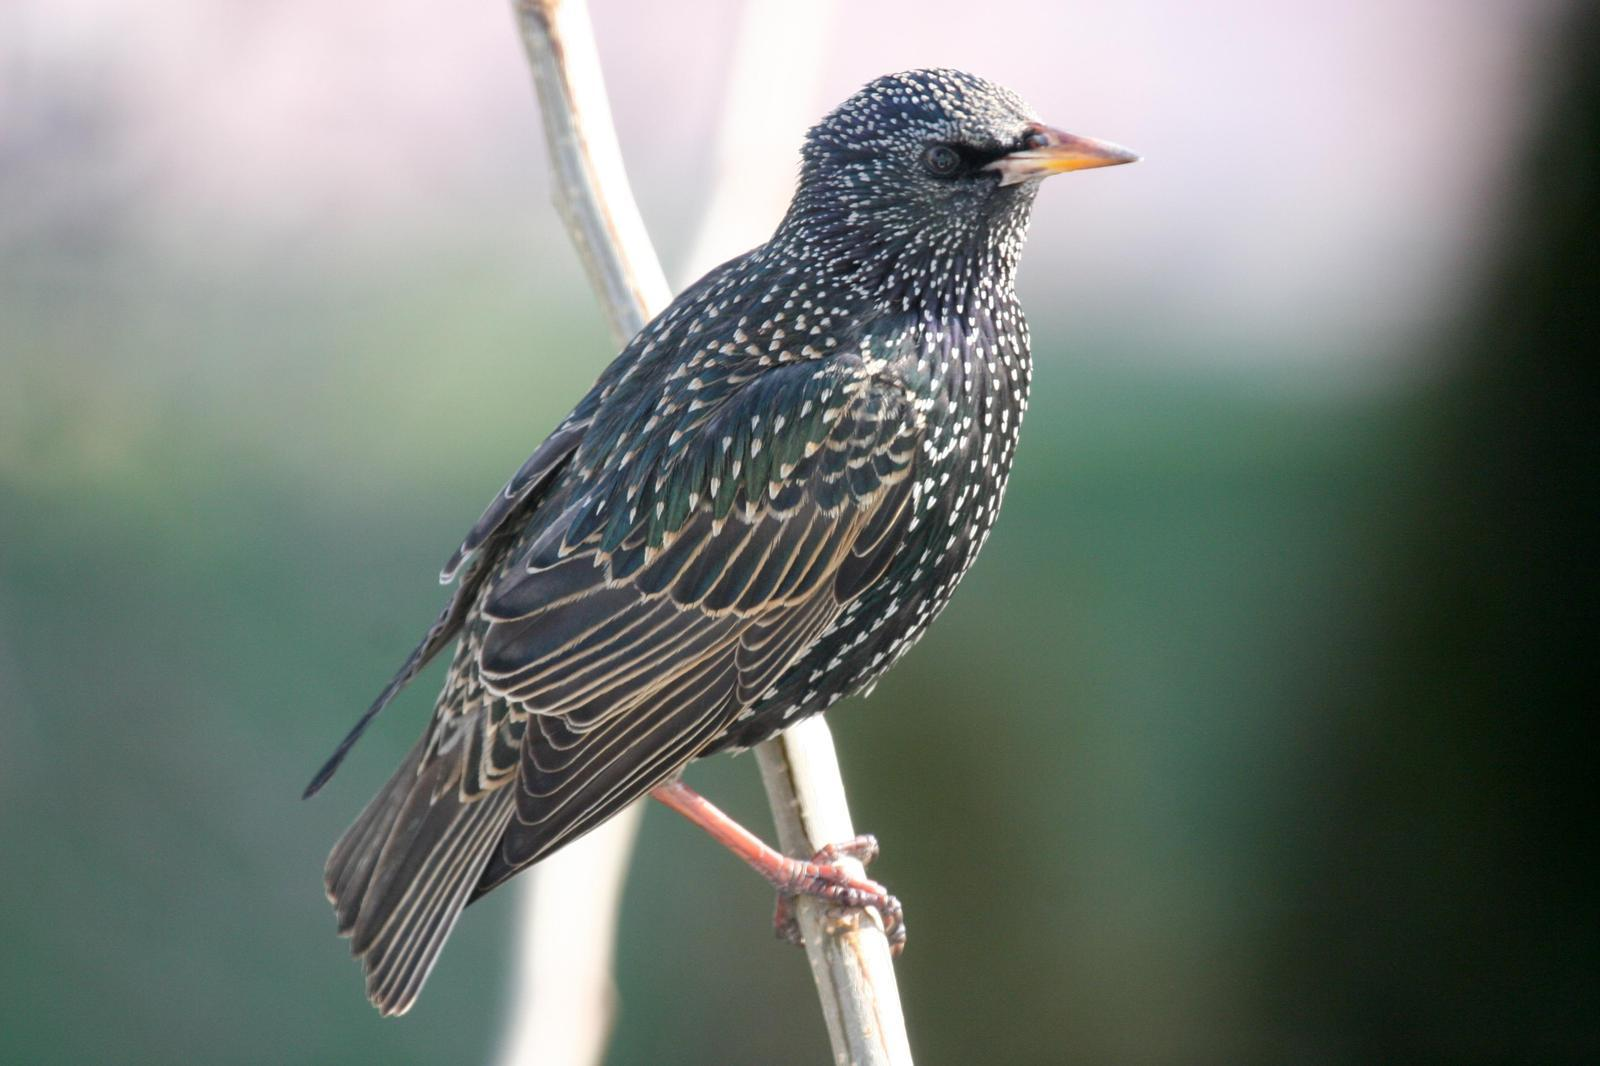 European Starling Photo by Roseanne CALECA